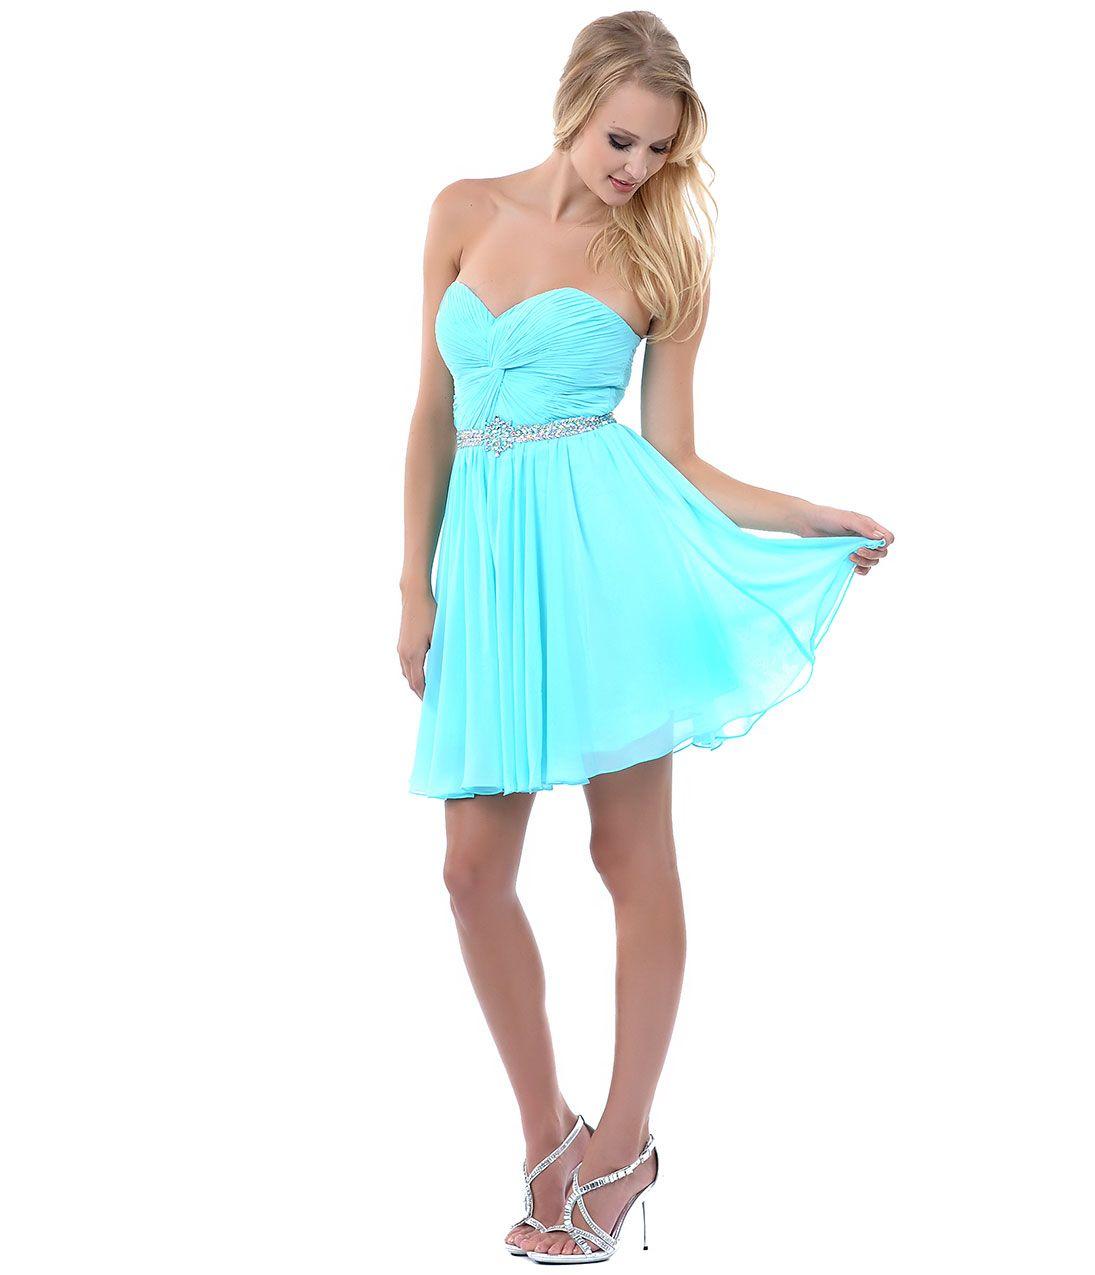 short rayol blue bridesmaid dresses   Strapless Sequin Chiffon Short ...